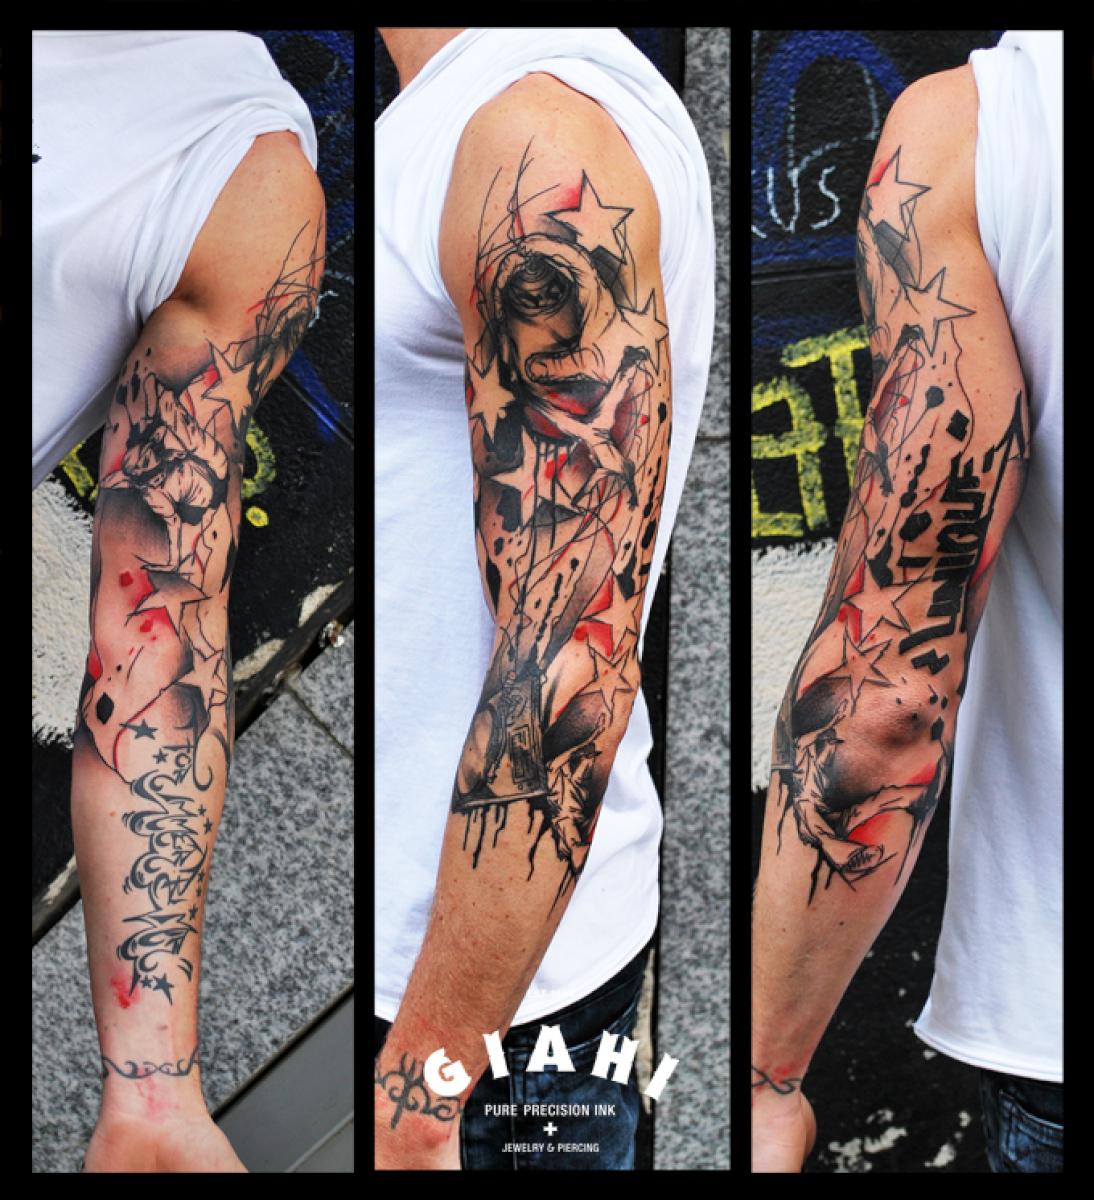 Graphiti Paint Aerosole Trash Polka tattoo by Live Two